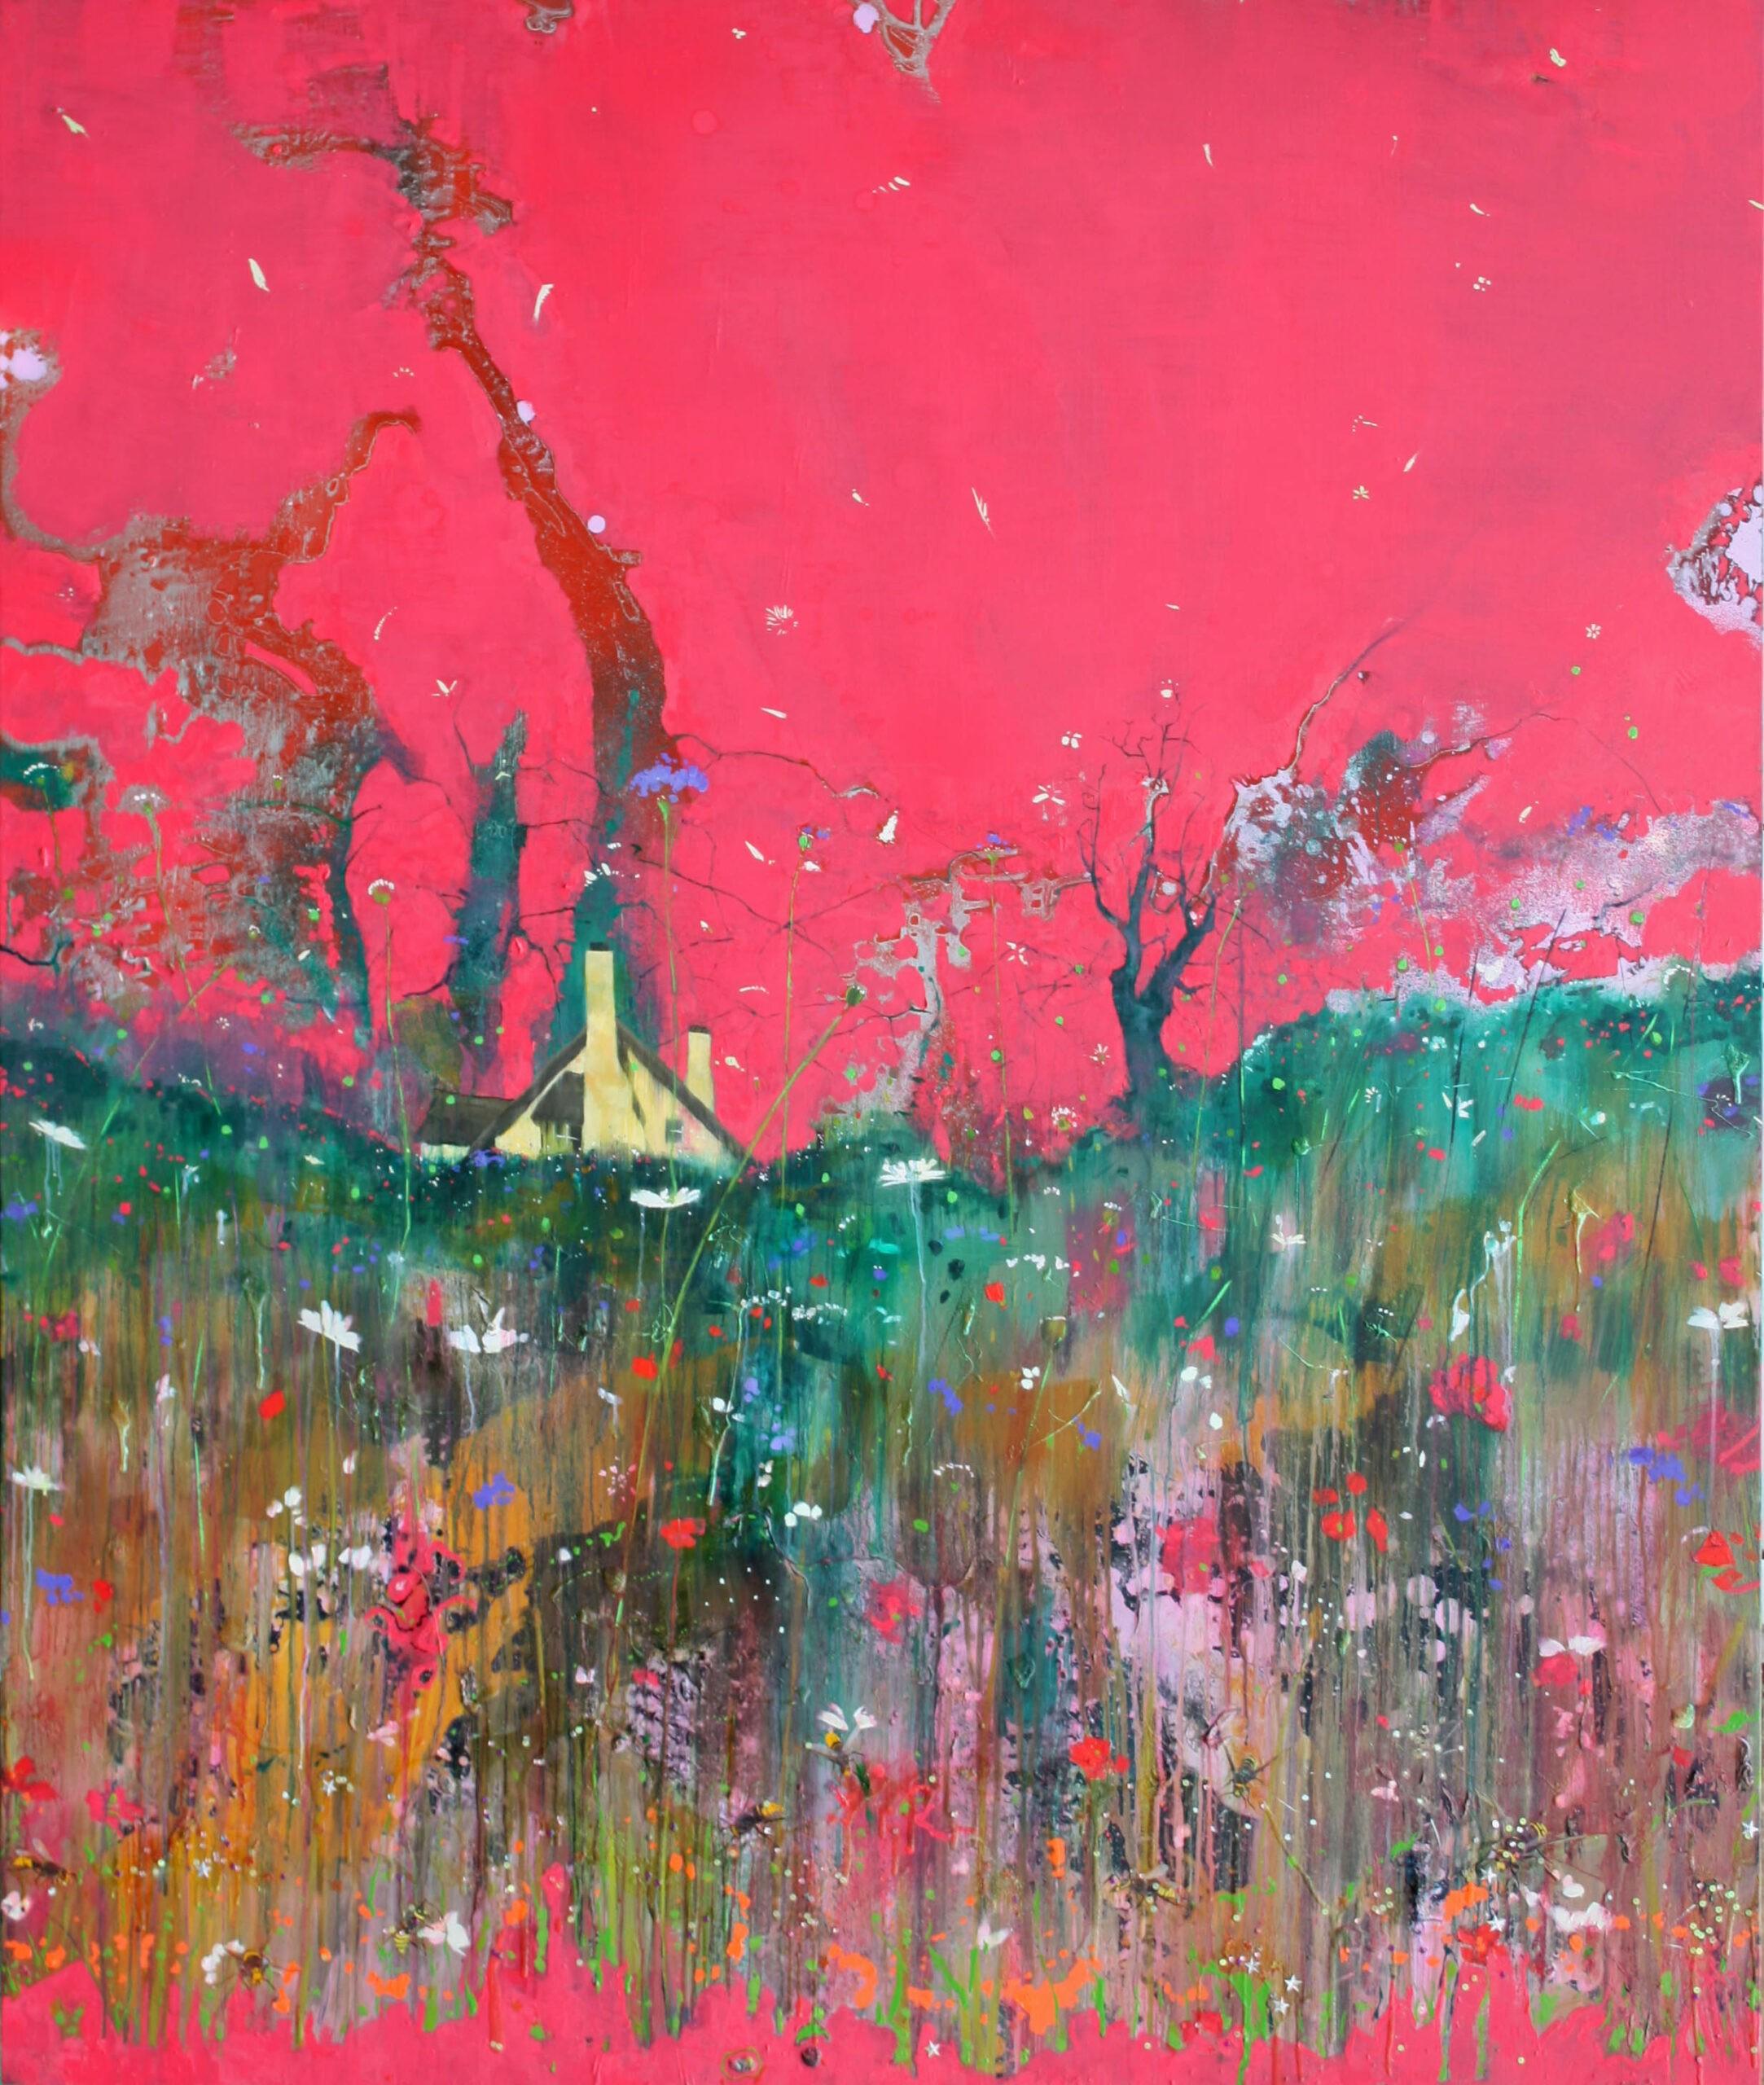 Meadow 183 x 152 cm oil on canvas